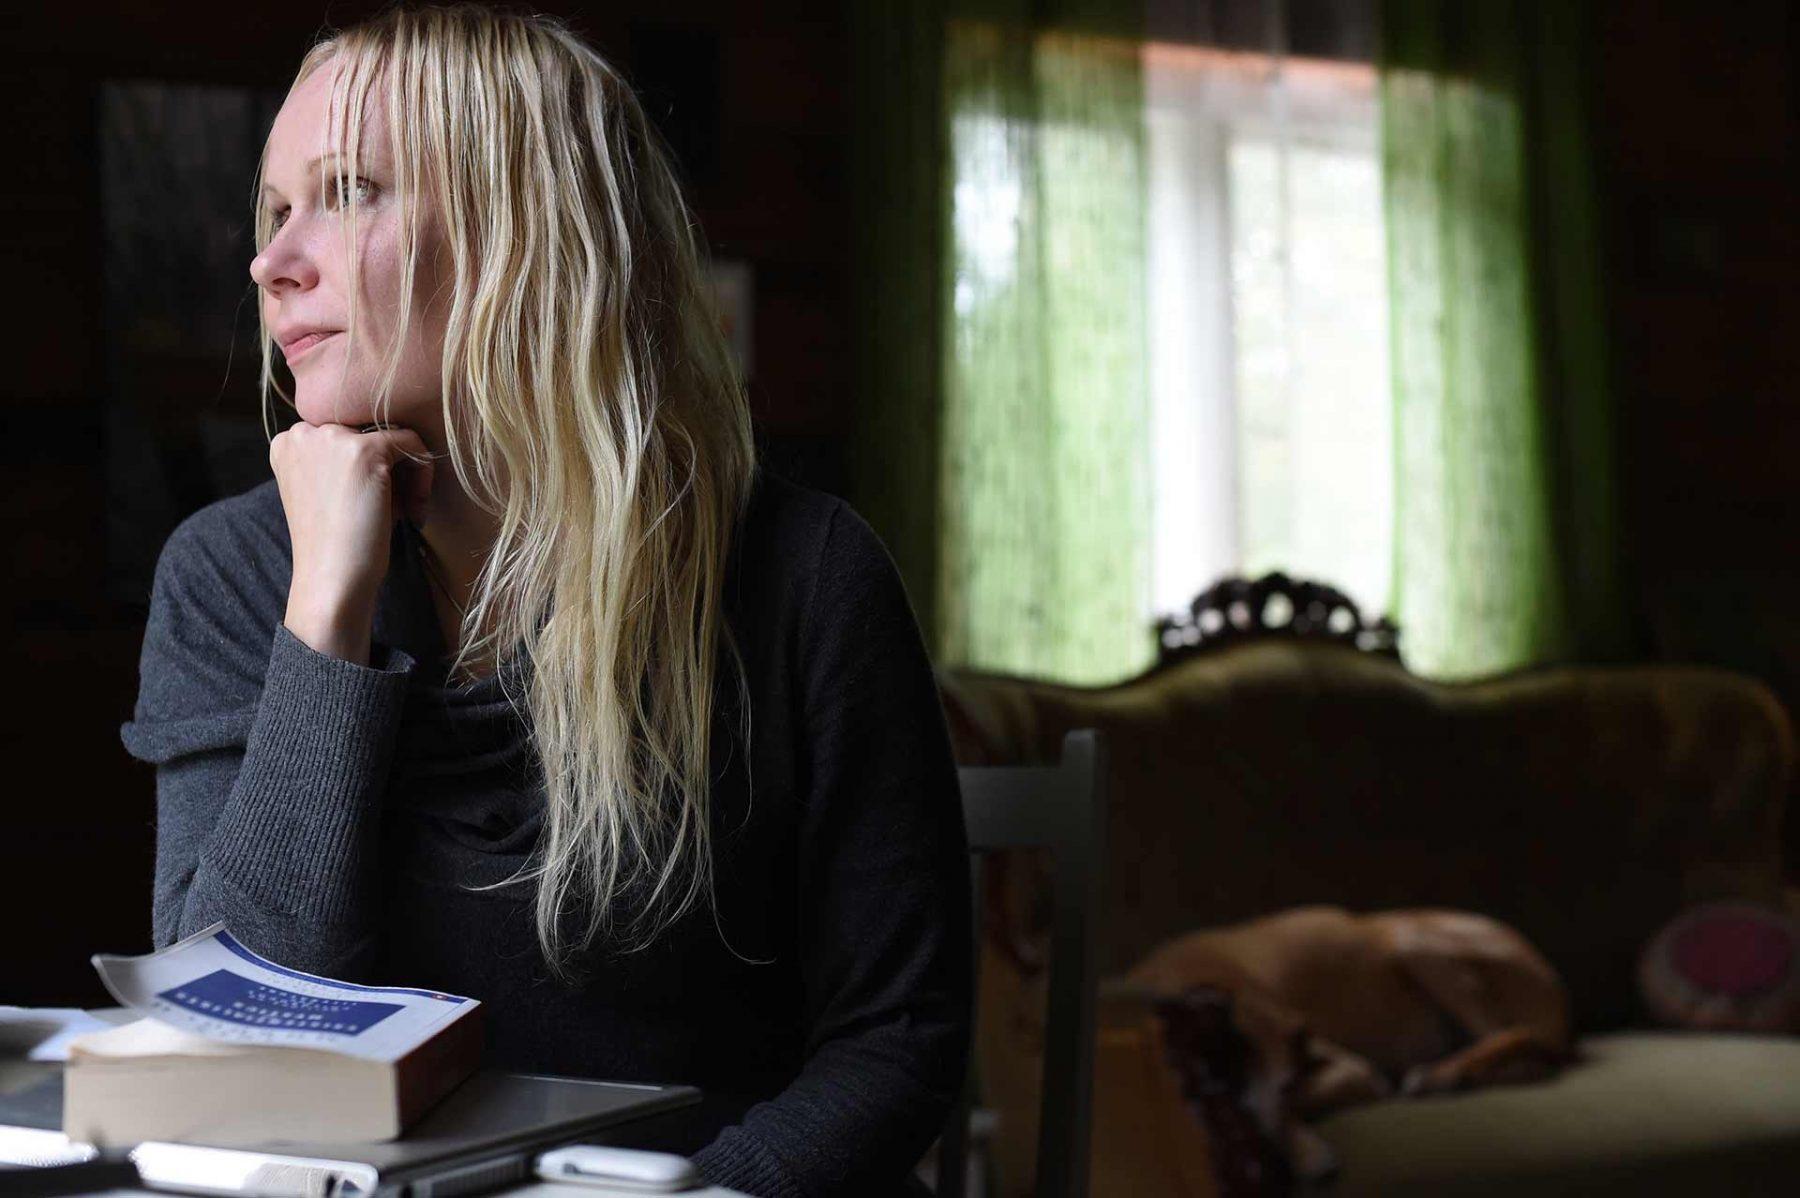 Elisa Aaltola, philosopher and author. Finland, 2015